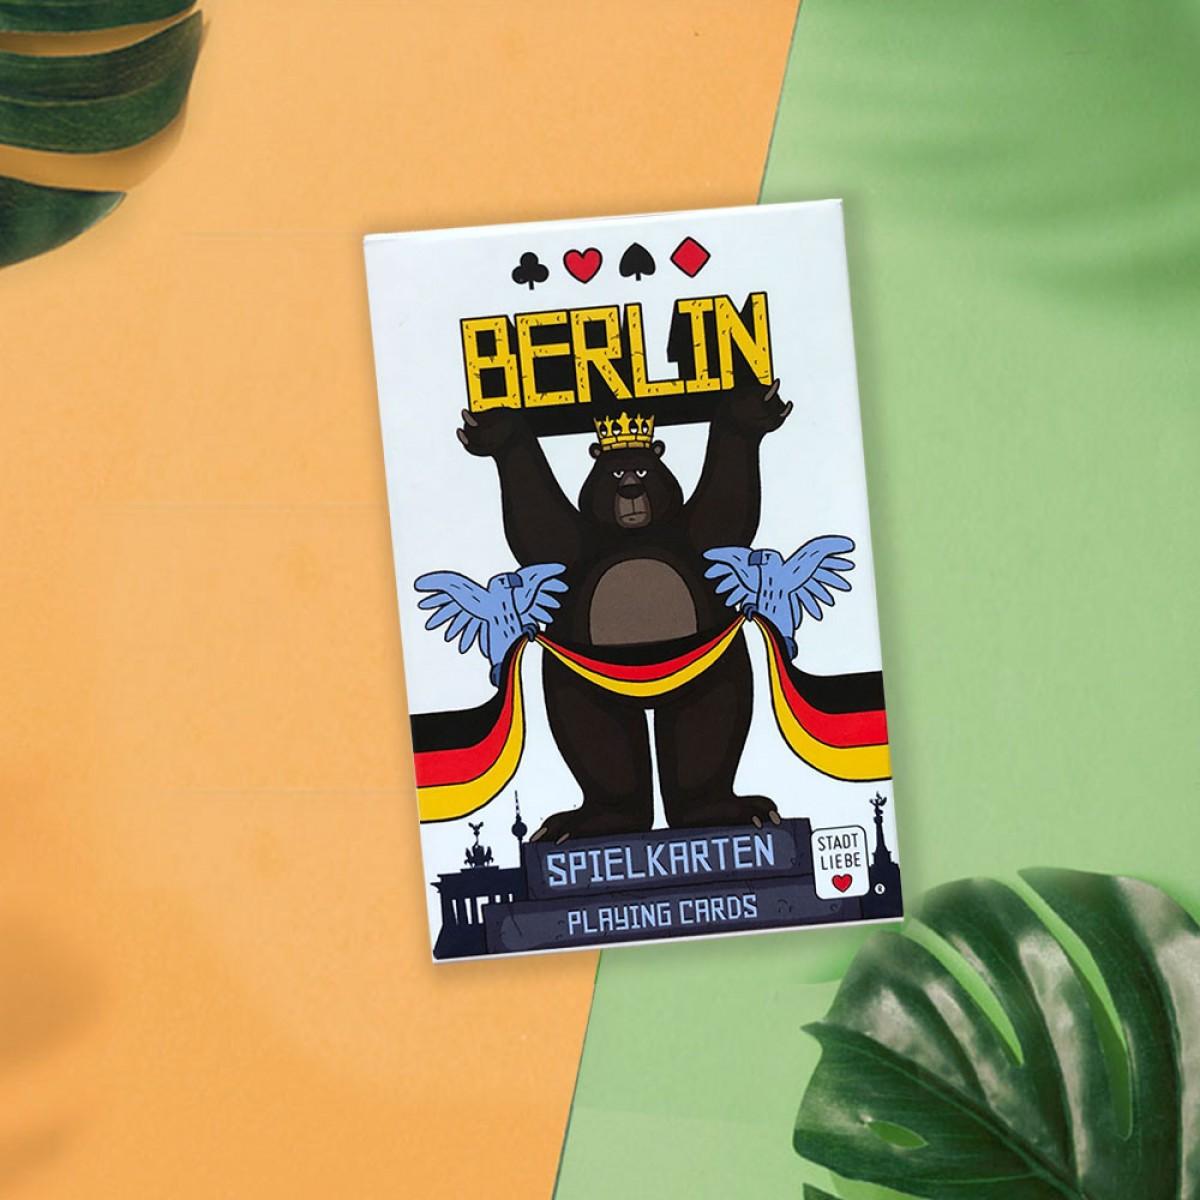 "Stadtliebe® | Berlin Geschenk Set ""Freundschaft"" 8 Bierdeckel Postkarten mit Berlin Motiven und Spielkarten Set"